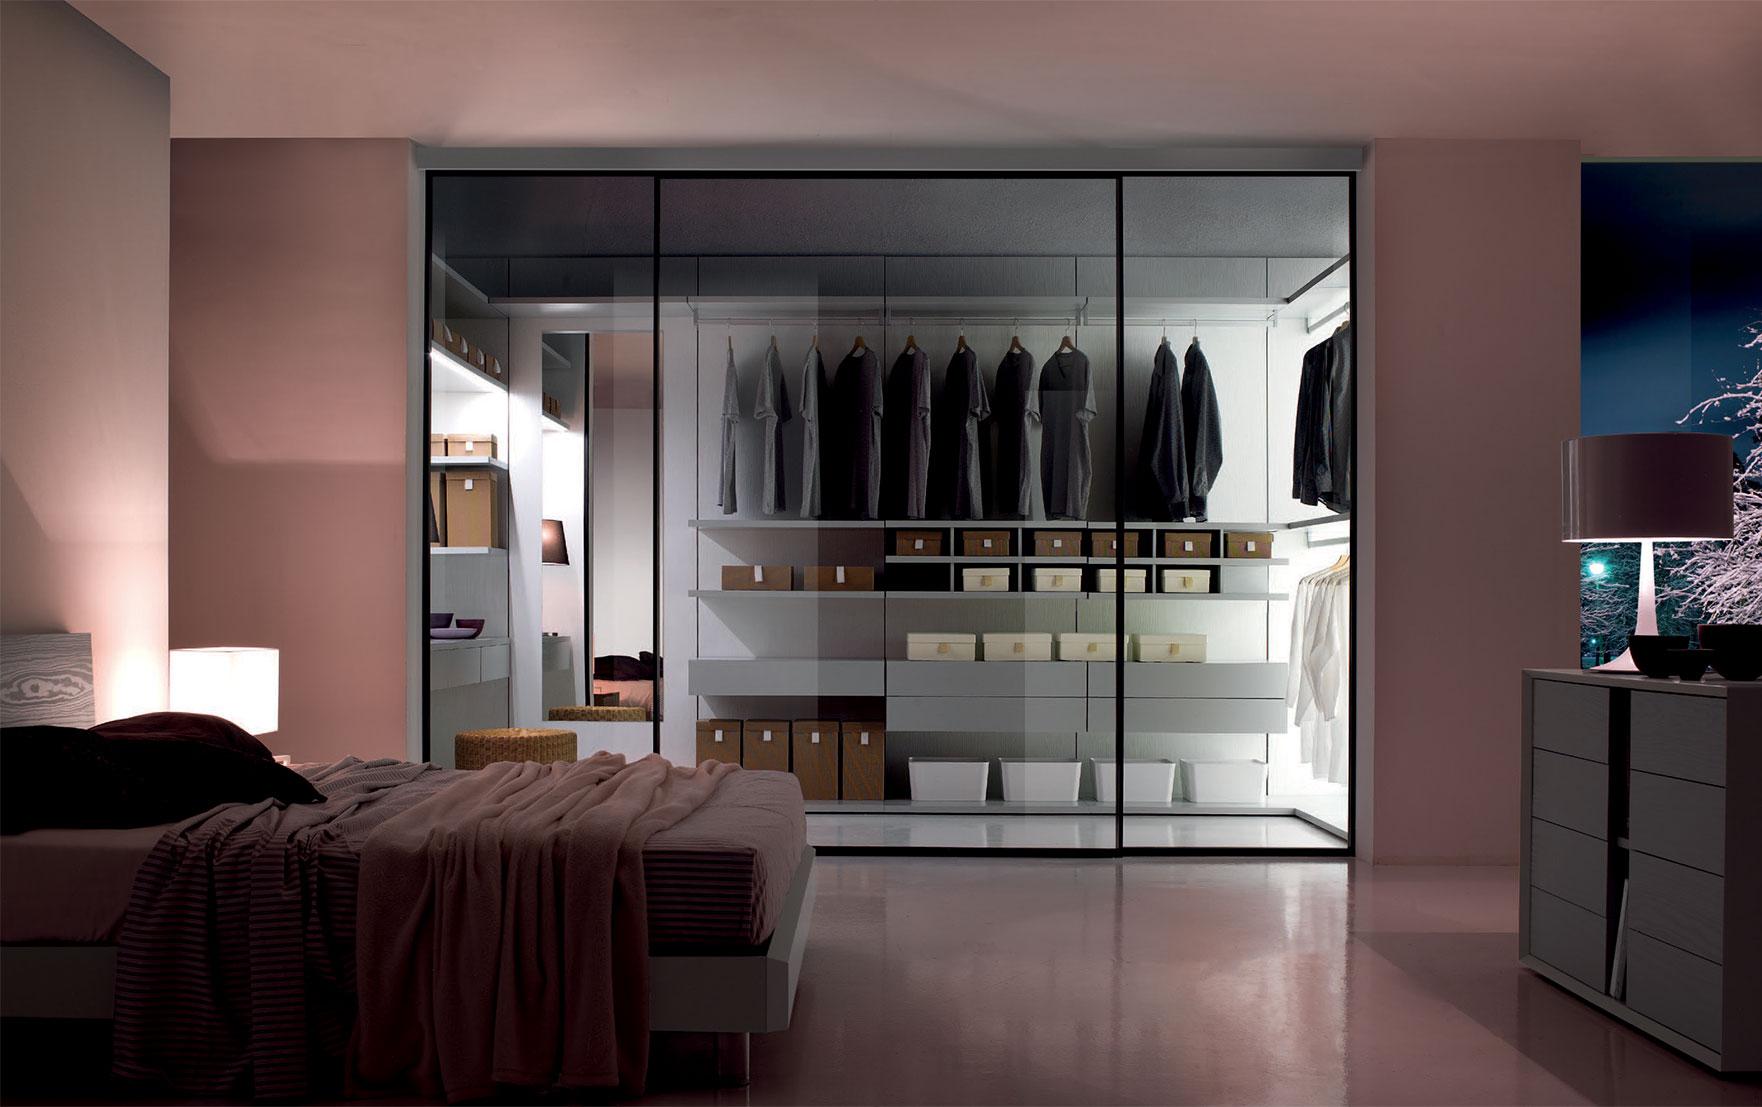 Cabina armadio a vista ecco le proposte burgio mobili for Cabina armadio